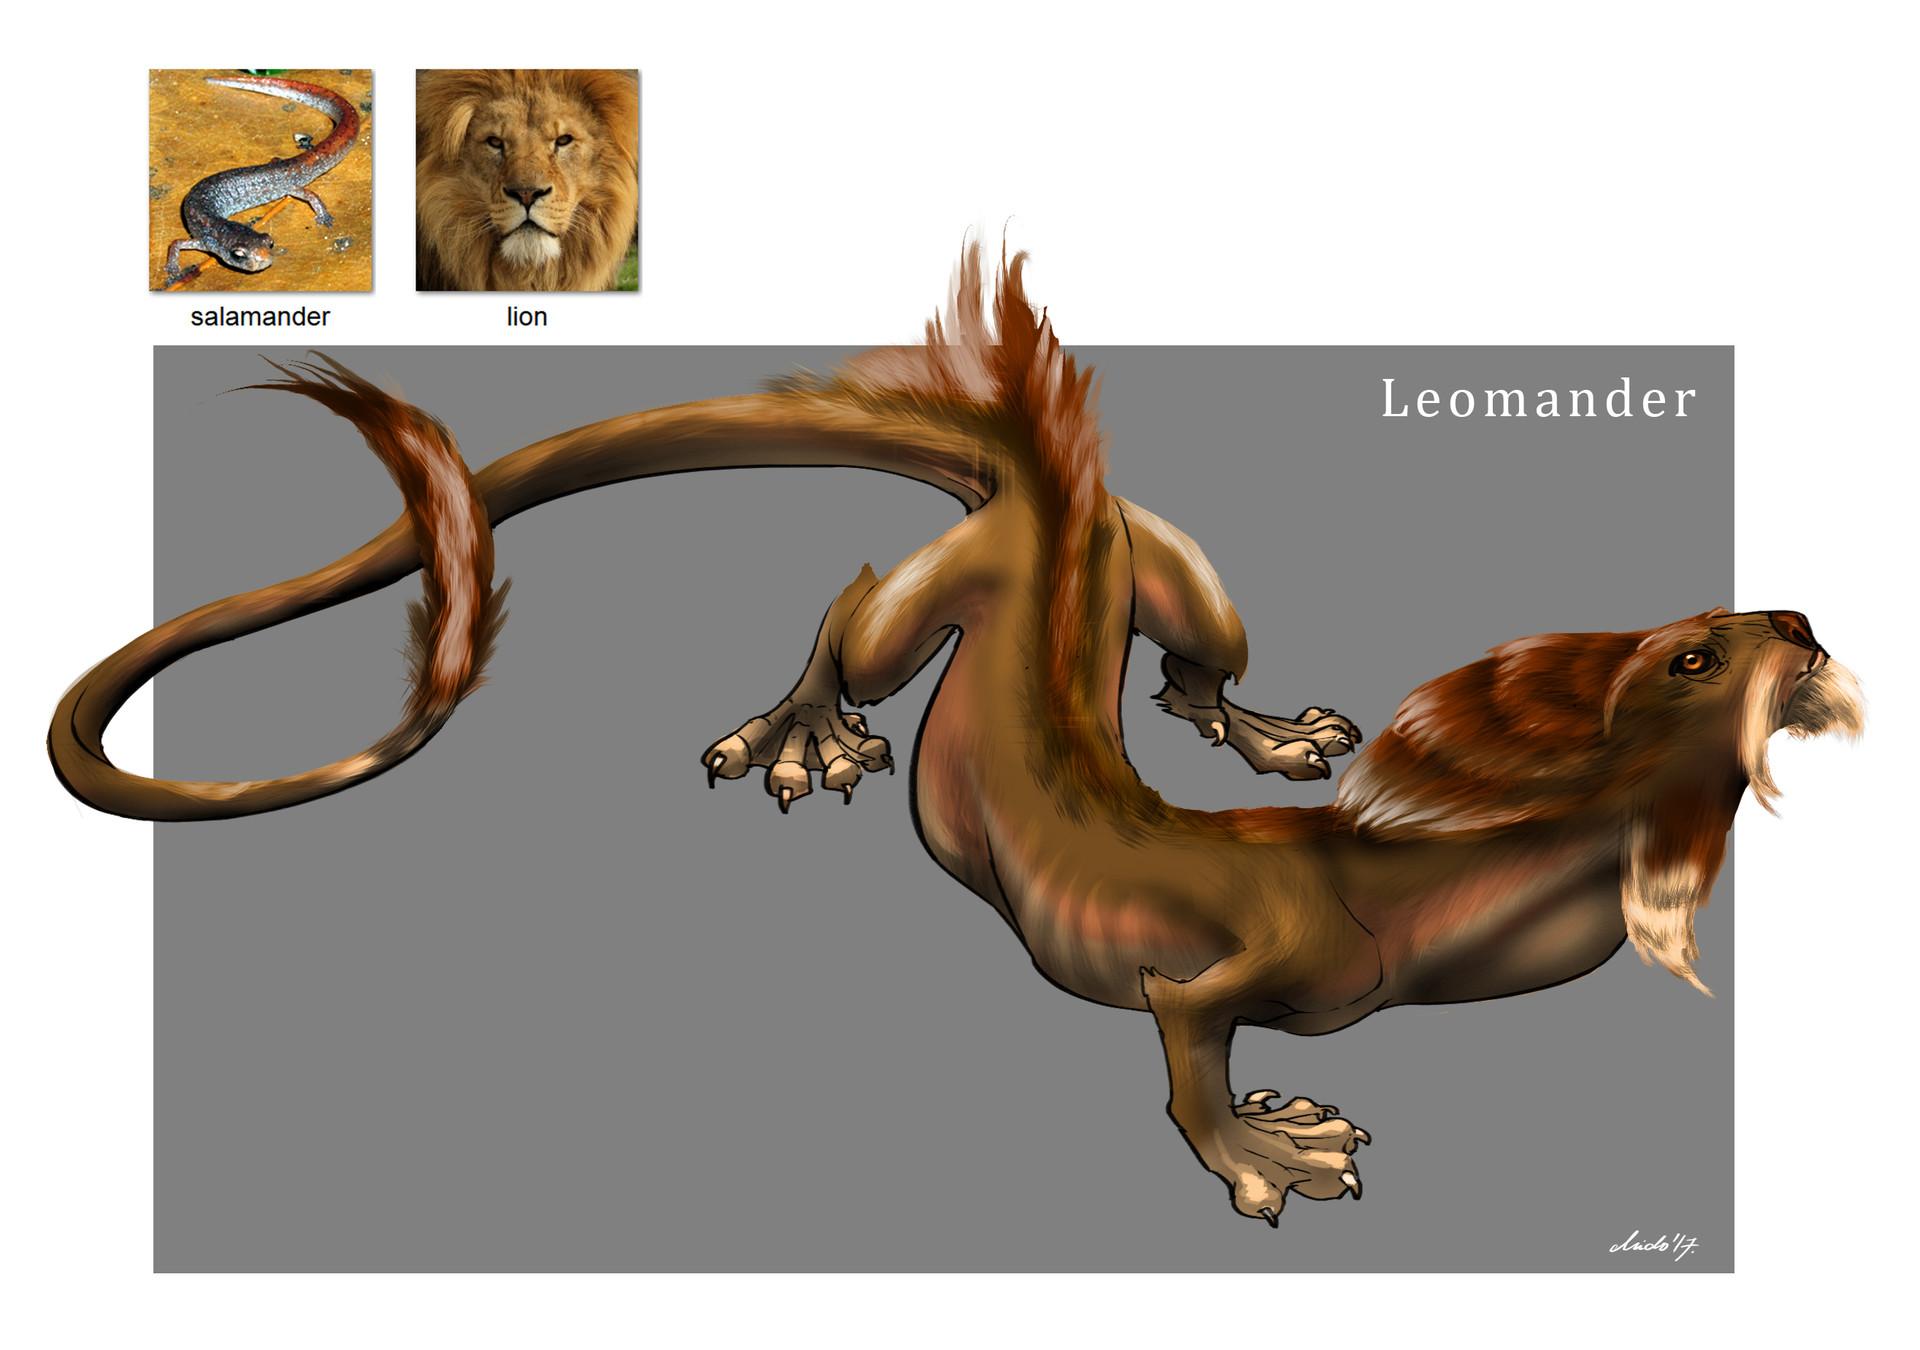 Midhat kapetanovic random creature mashup 013 leomander